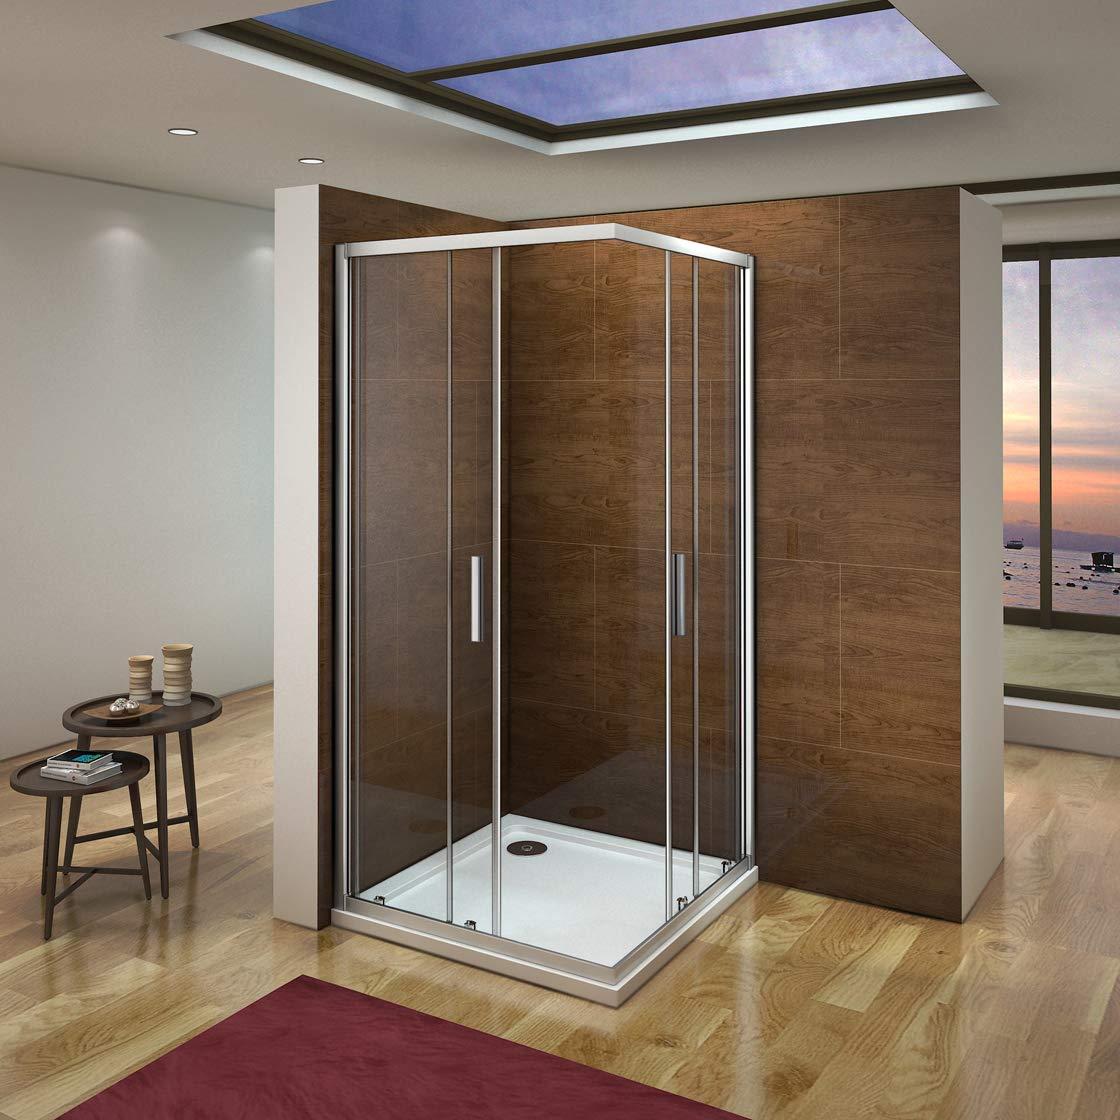 Mampara de Ducha Angular cabina de ducha mampara de ducha cuadrada ...